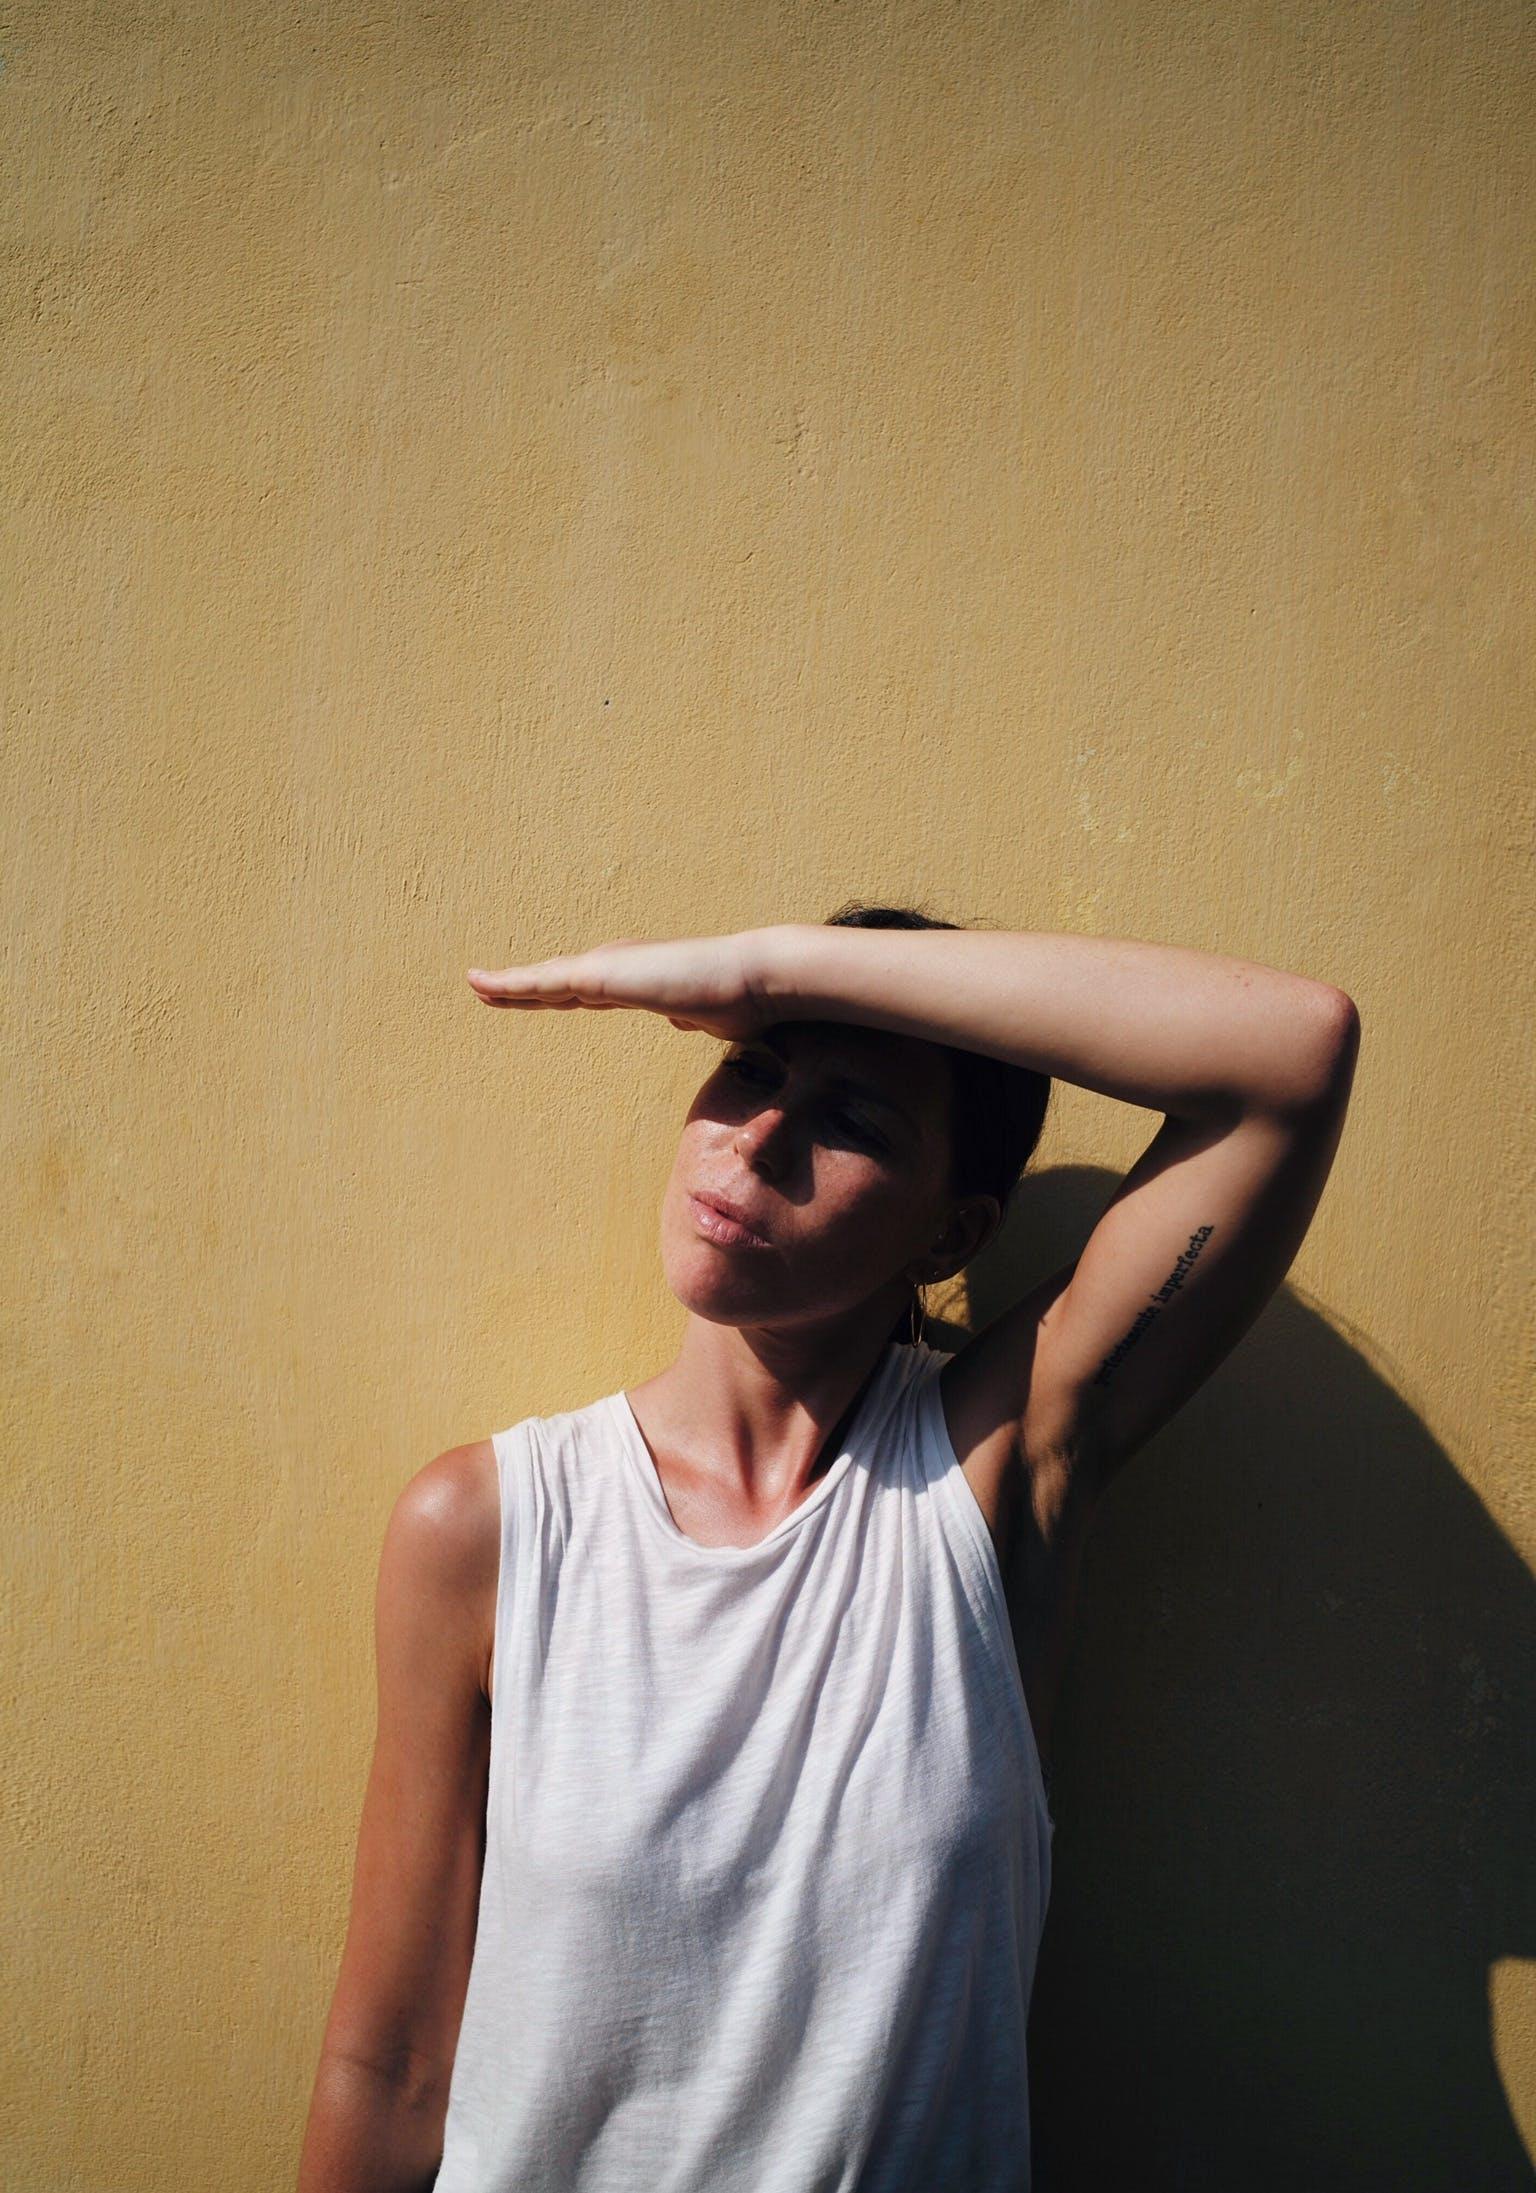 Woman in White Sleeveless Shirt